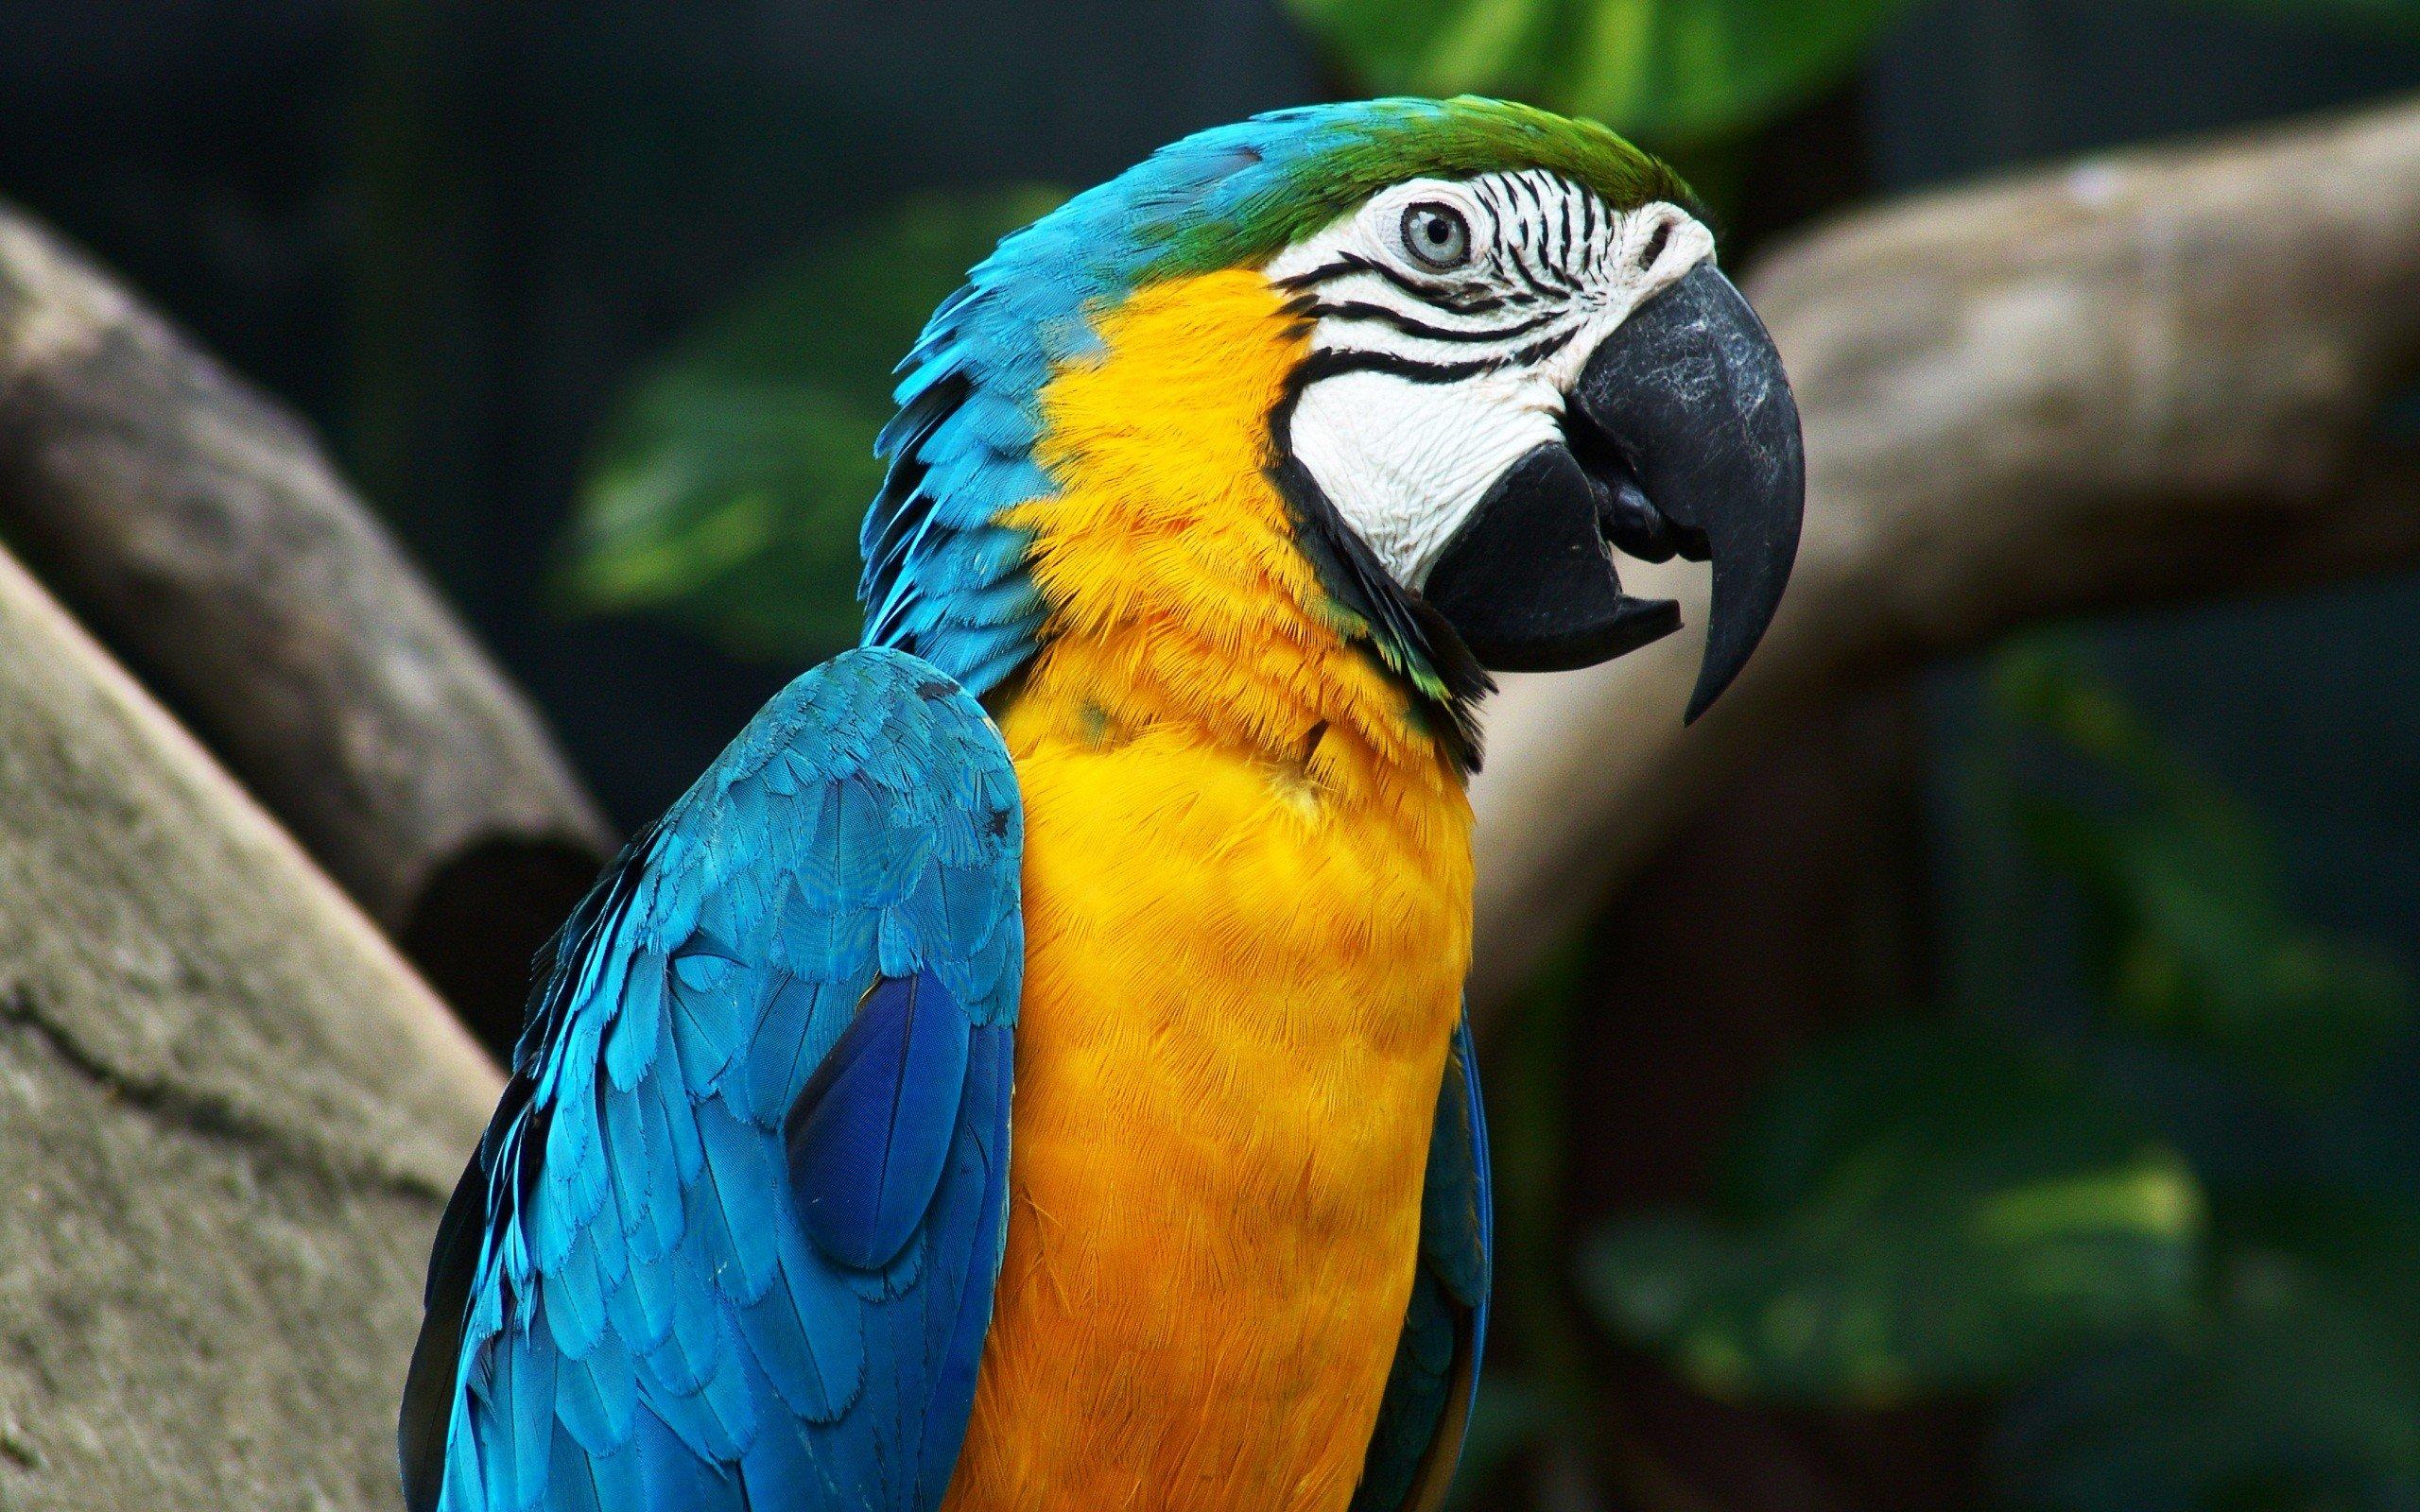 Wallpaper 2560x1600 Px Birds Macaws 2560x1600 Wallhaven 1336139 Hd Wallpapers Wallhere